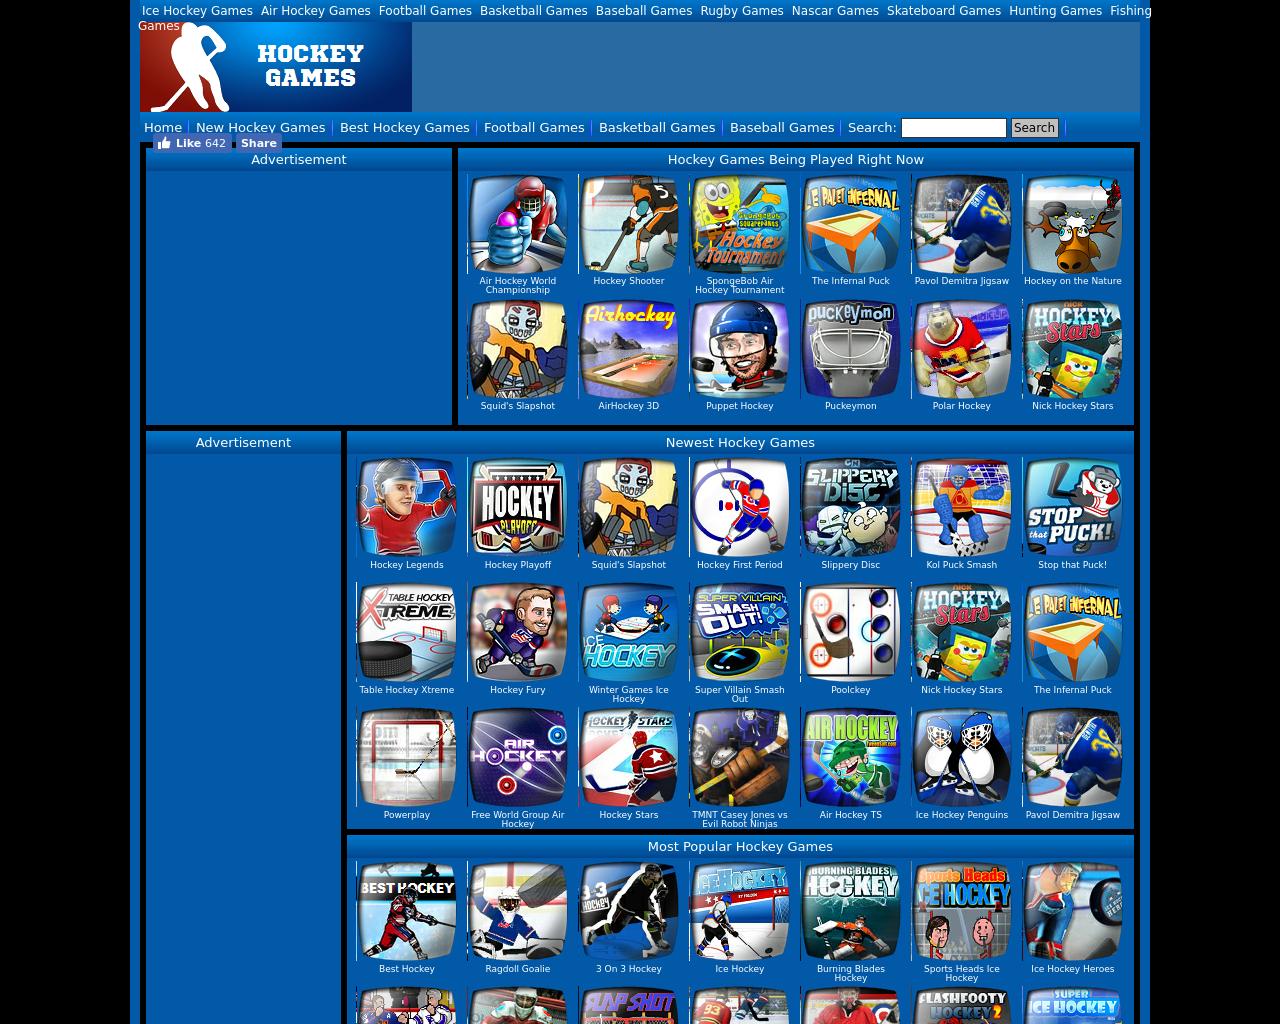 HOCKEY-GAMES-Advertising-Reviews-Pricing